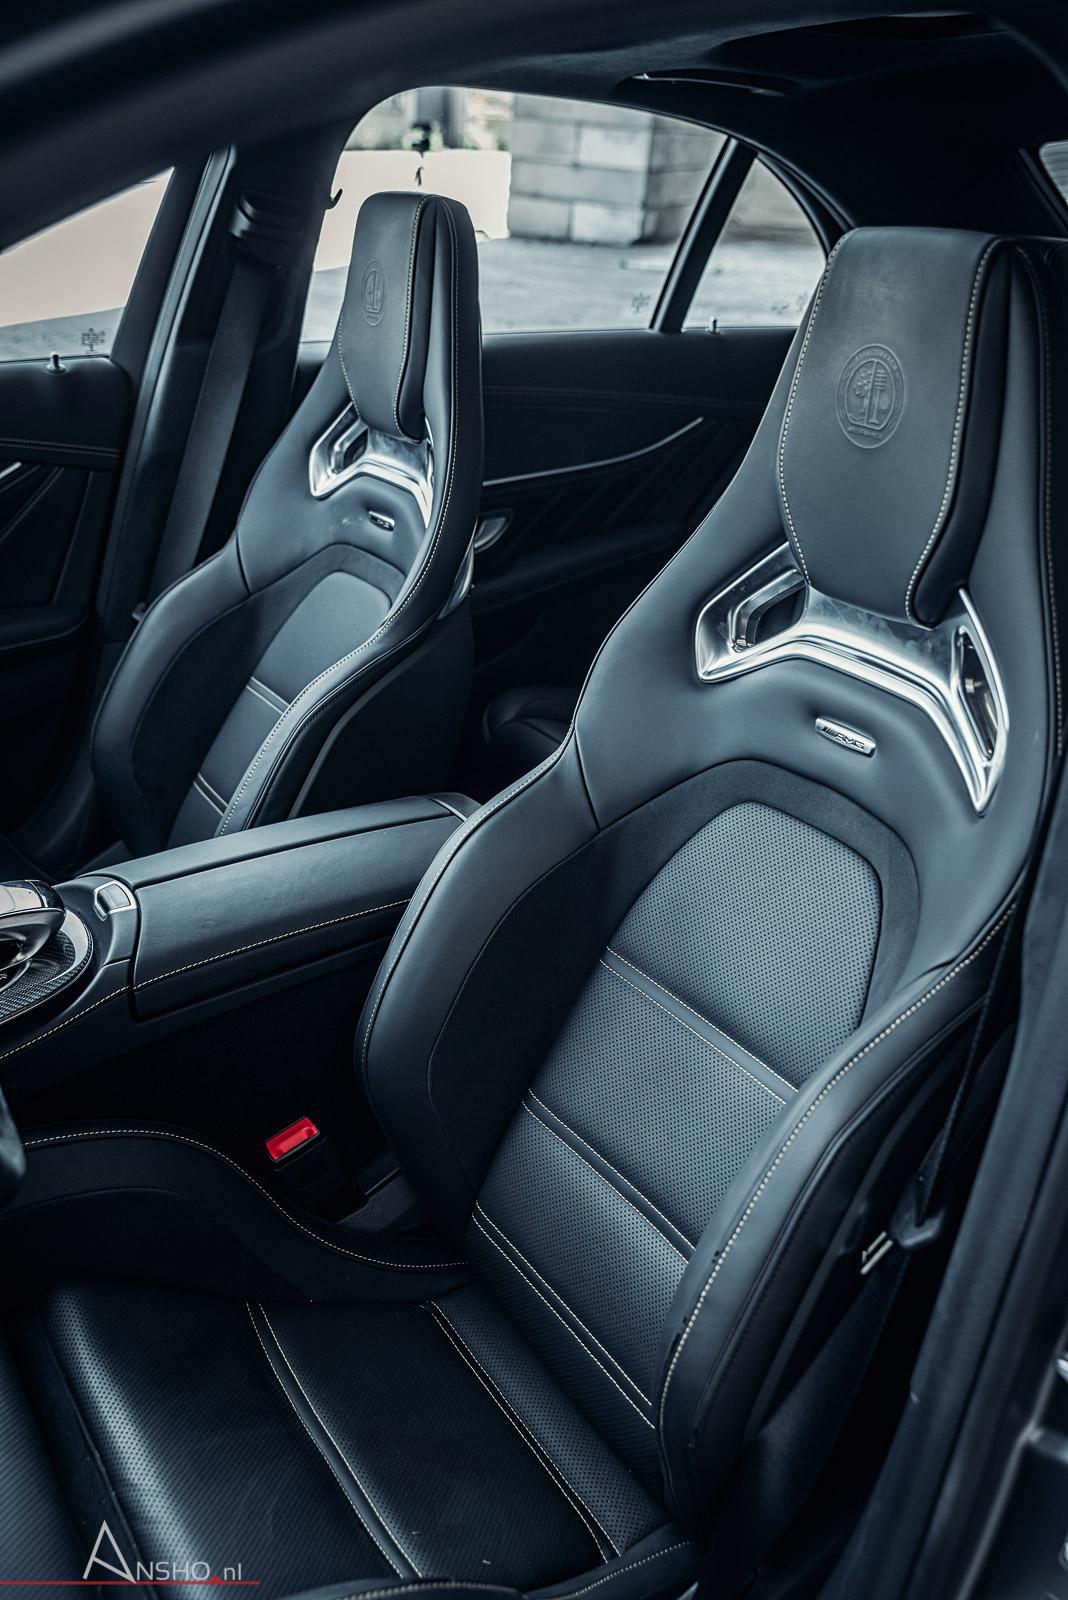 2017 Mercedes-AMG E63 S 4MATIC+